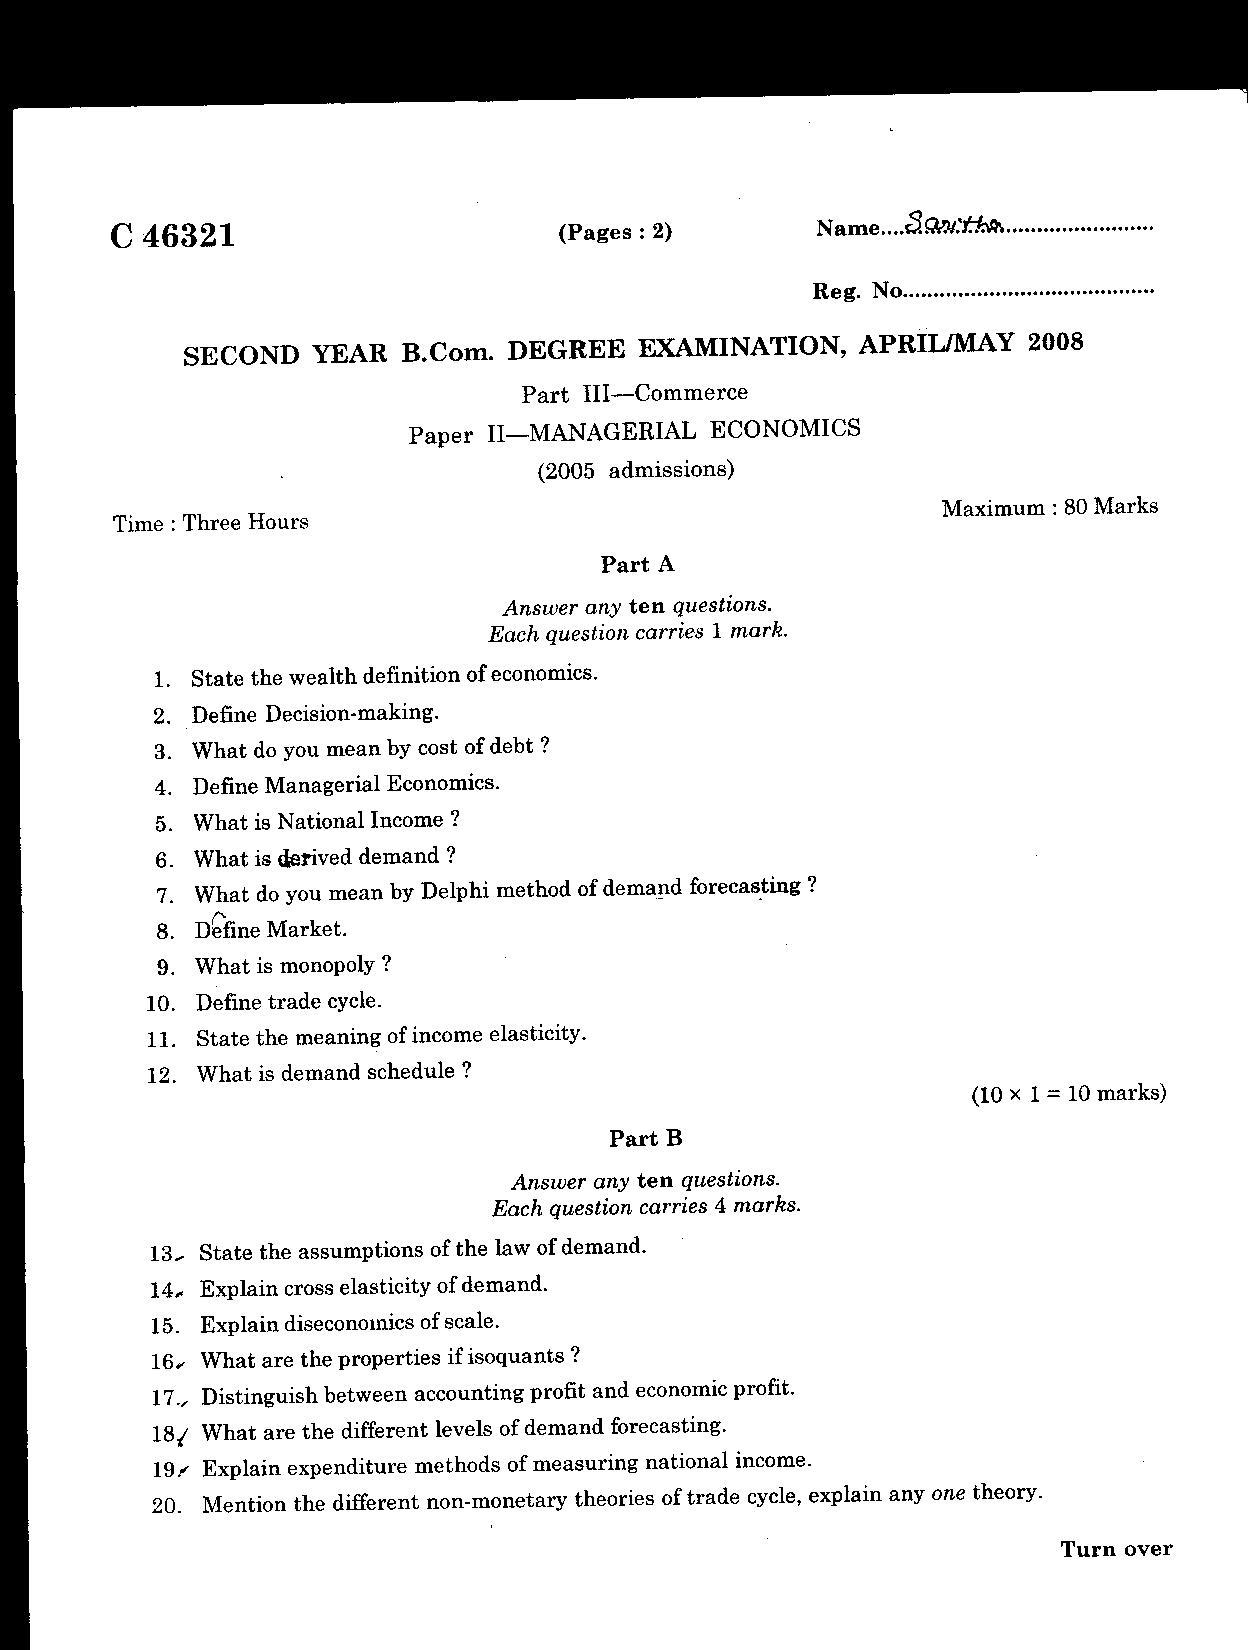 Managerial Economics Questions Papers Pune University